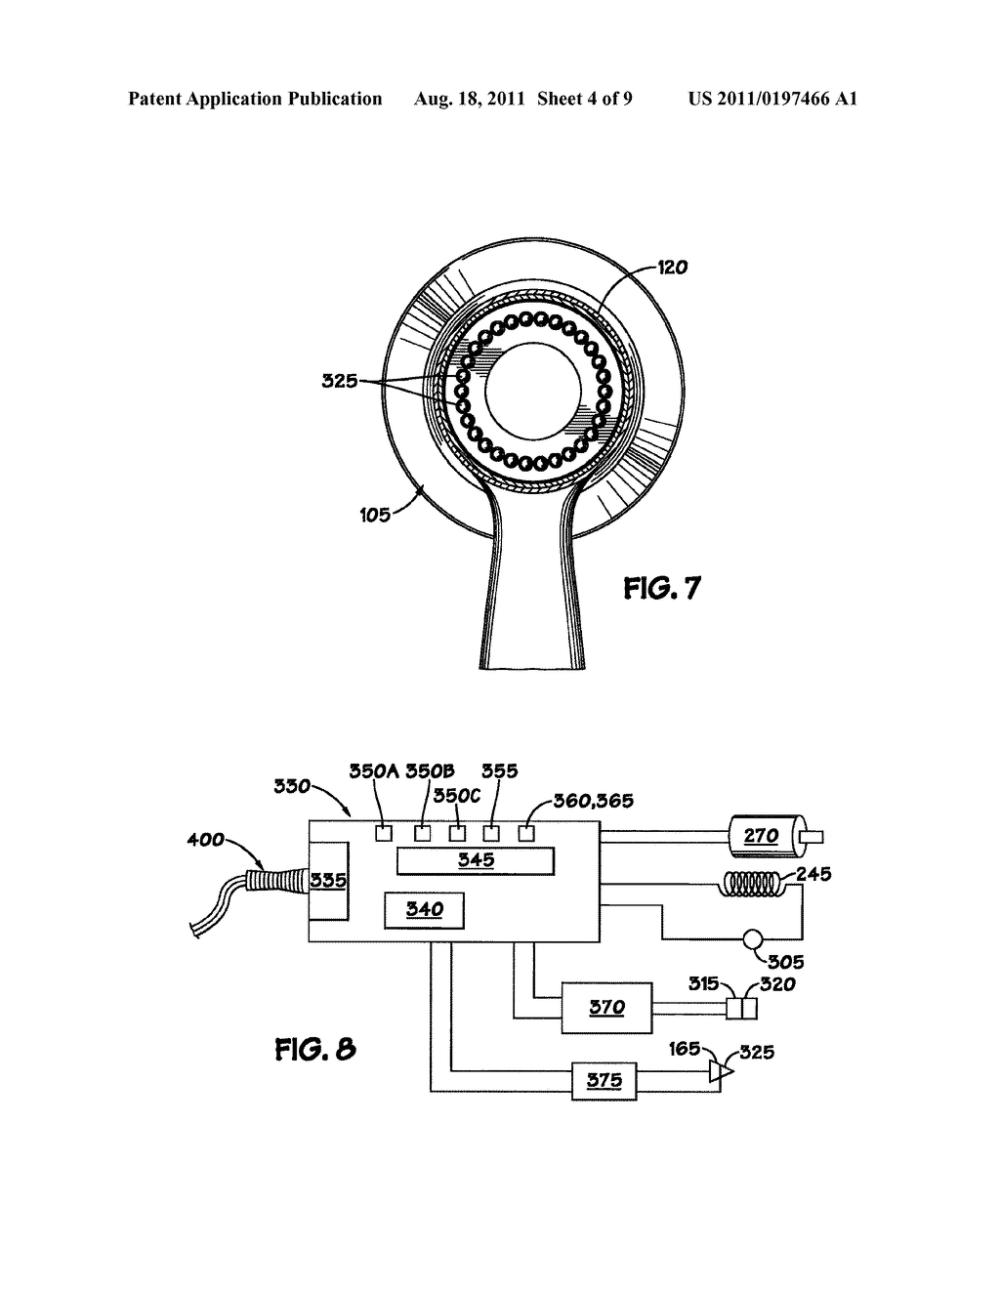 medium resolution of hair dryer diagram schematic and image 05hair dryer diagram 9